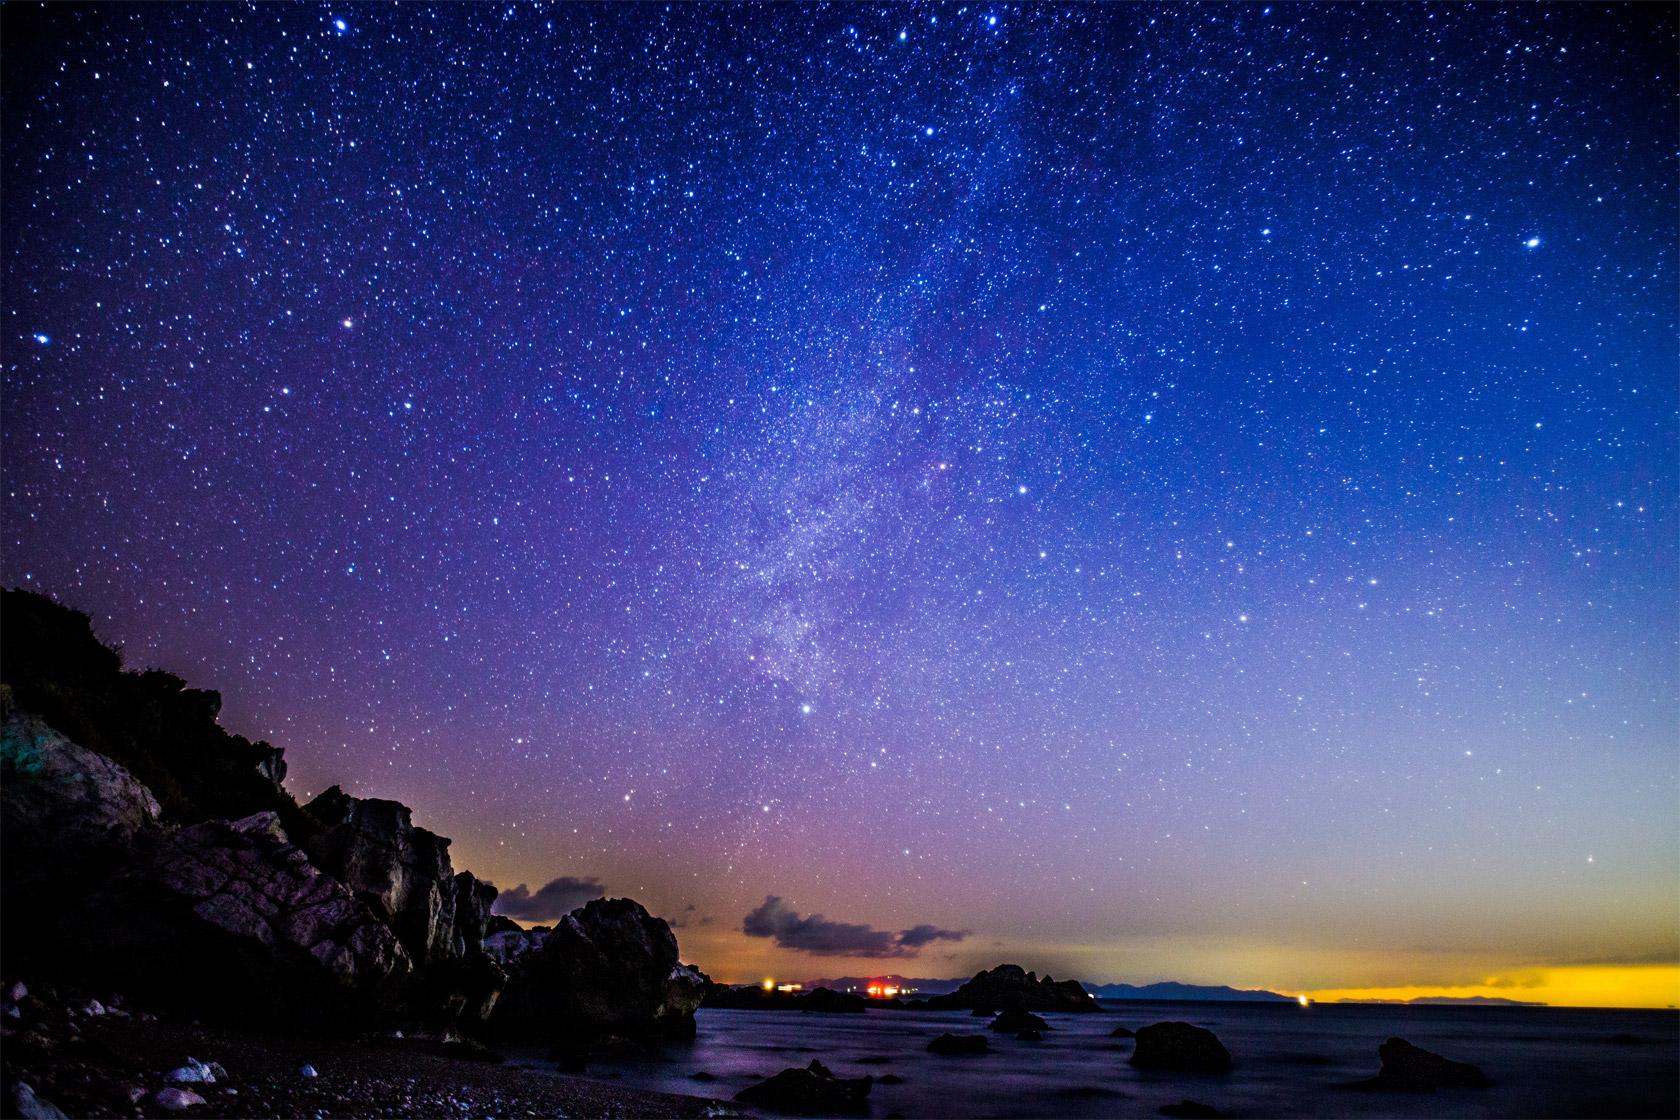 Image of dark blue skies and stars